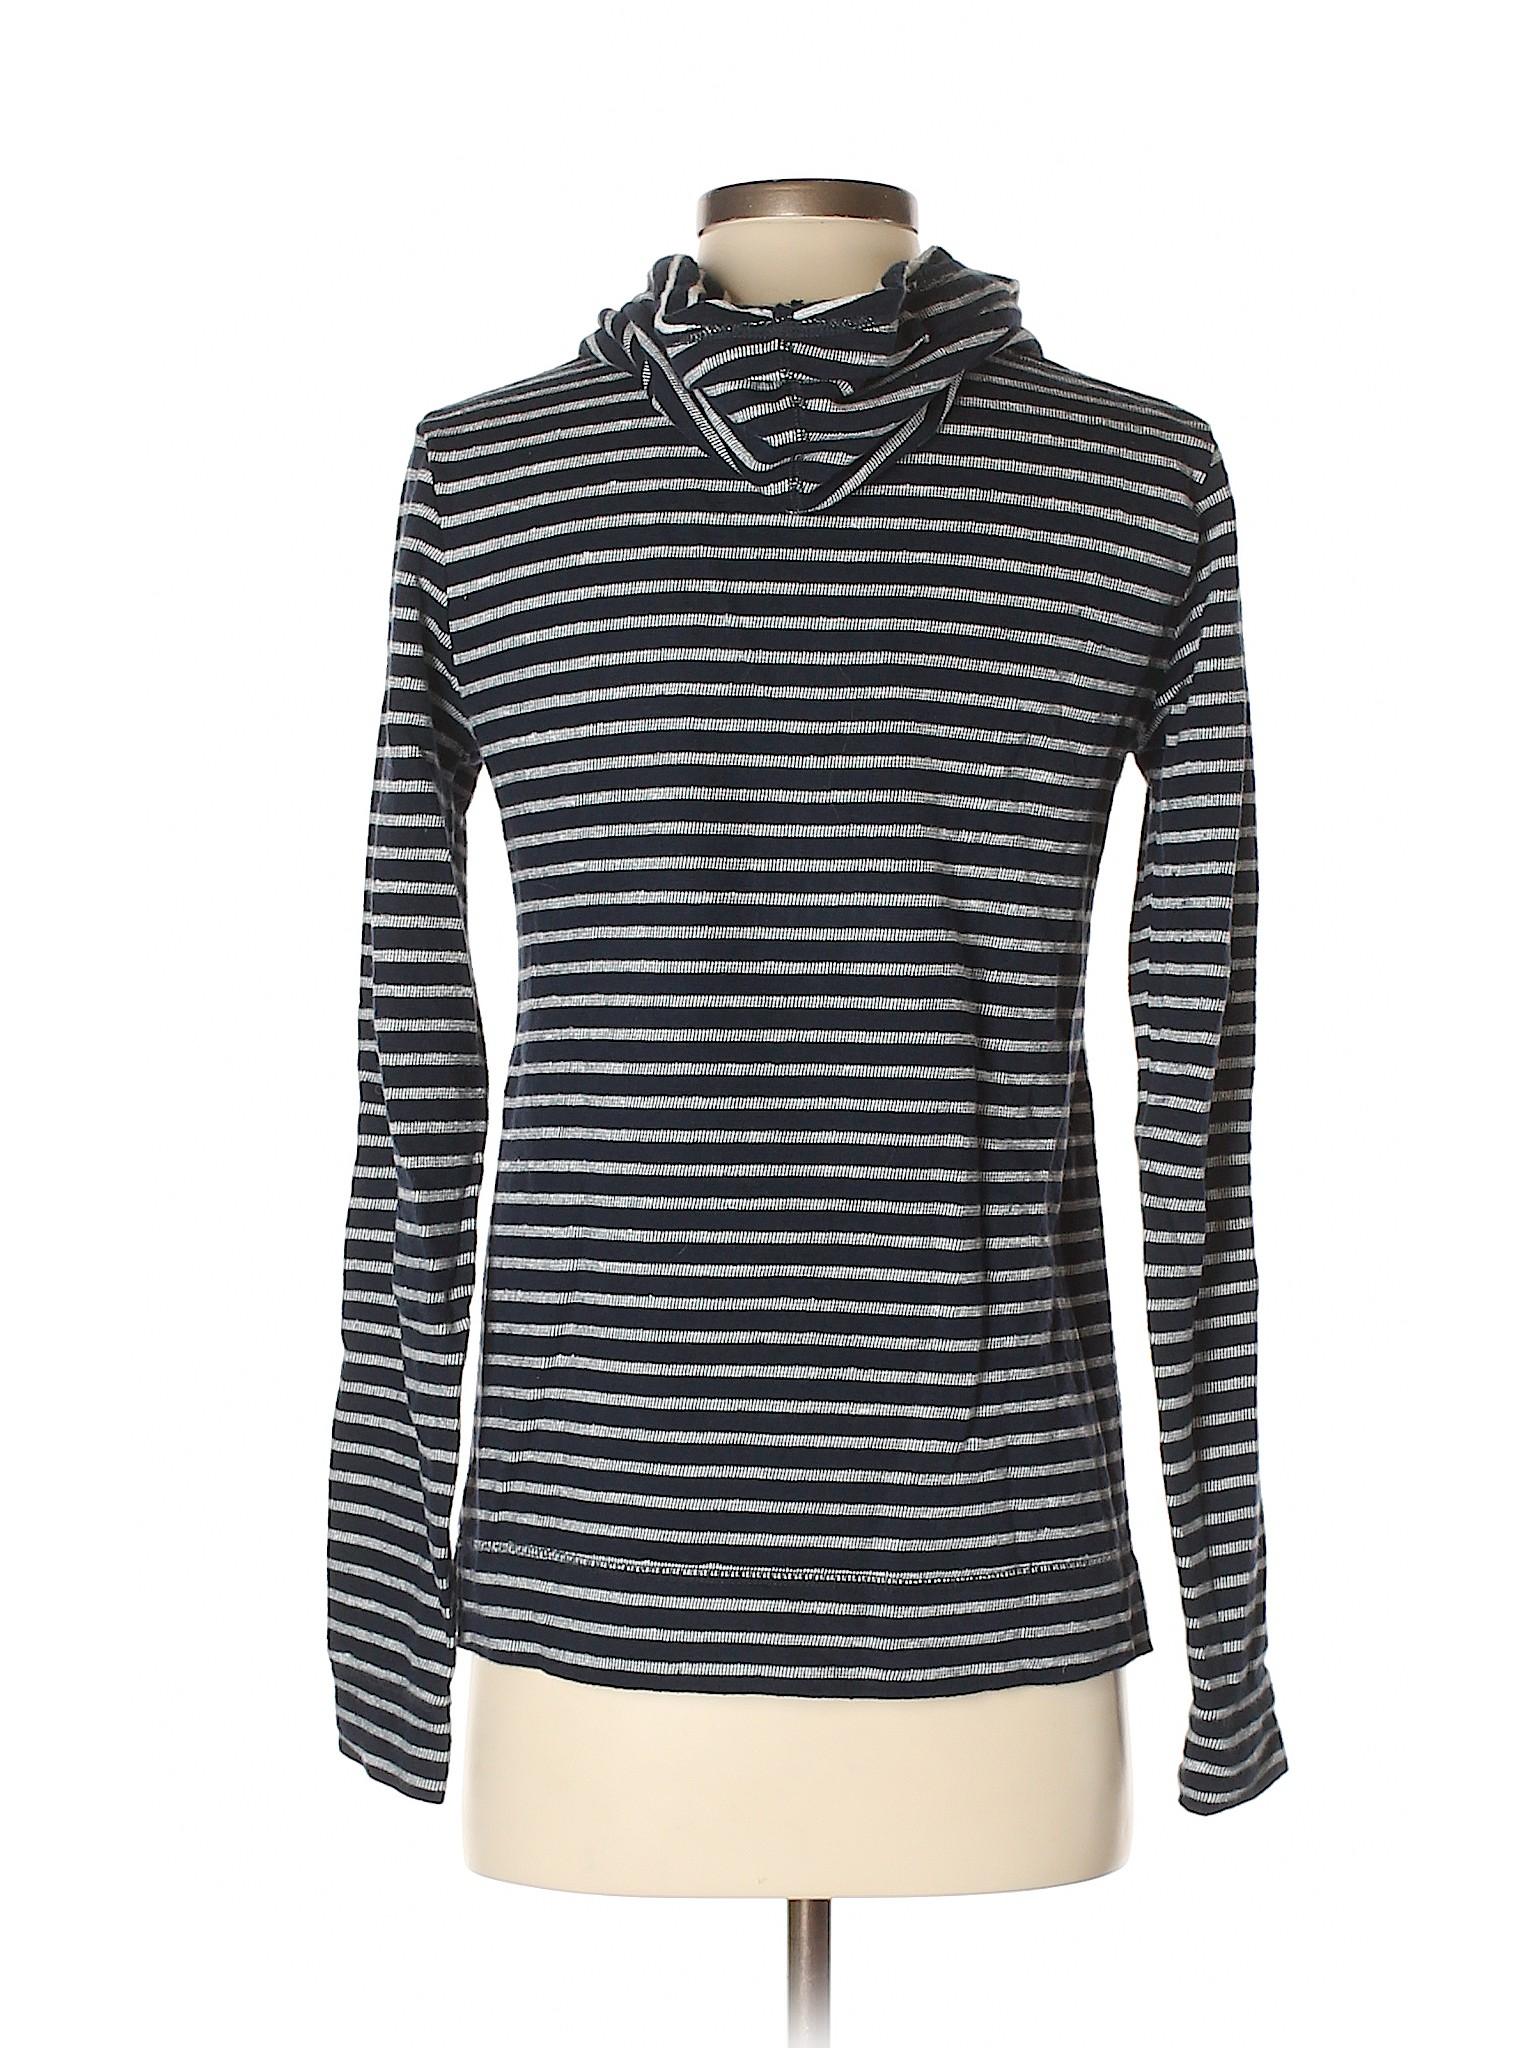 Pullover Boutique Crew J winter Sweater Uqxg7qt